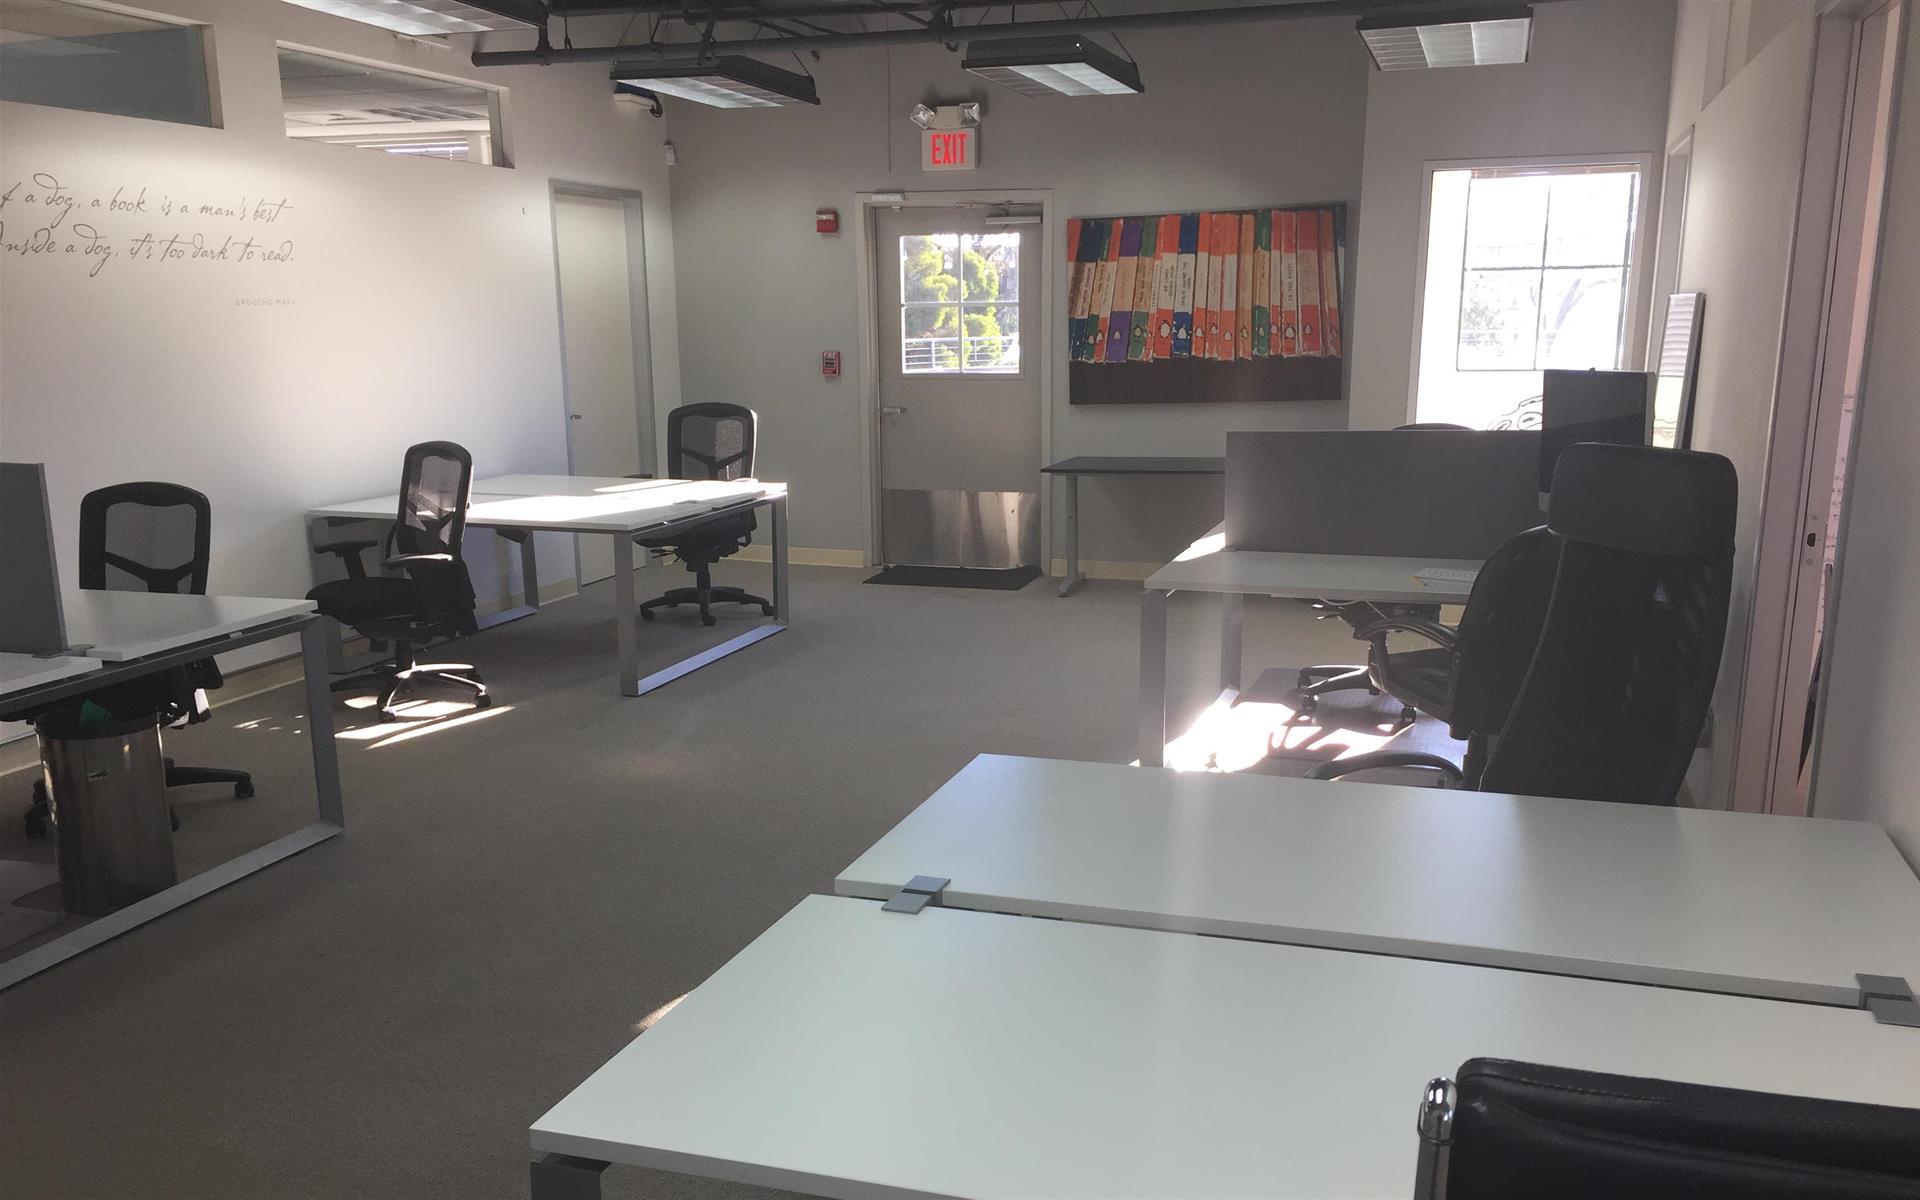 Metrodigi, Inc. - Desks in Open Workspace